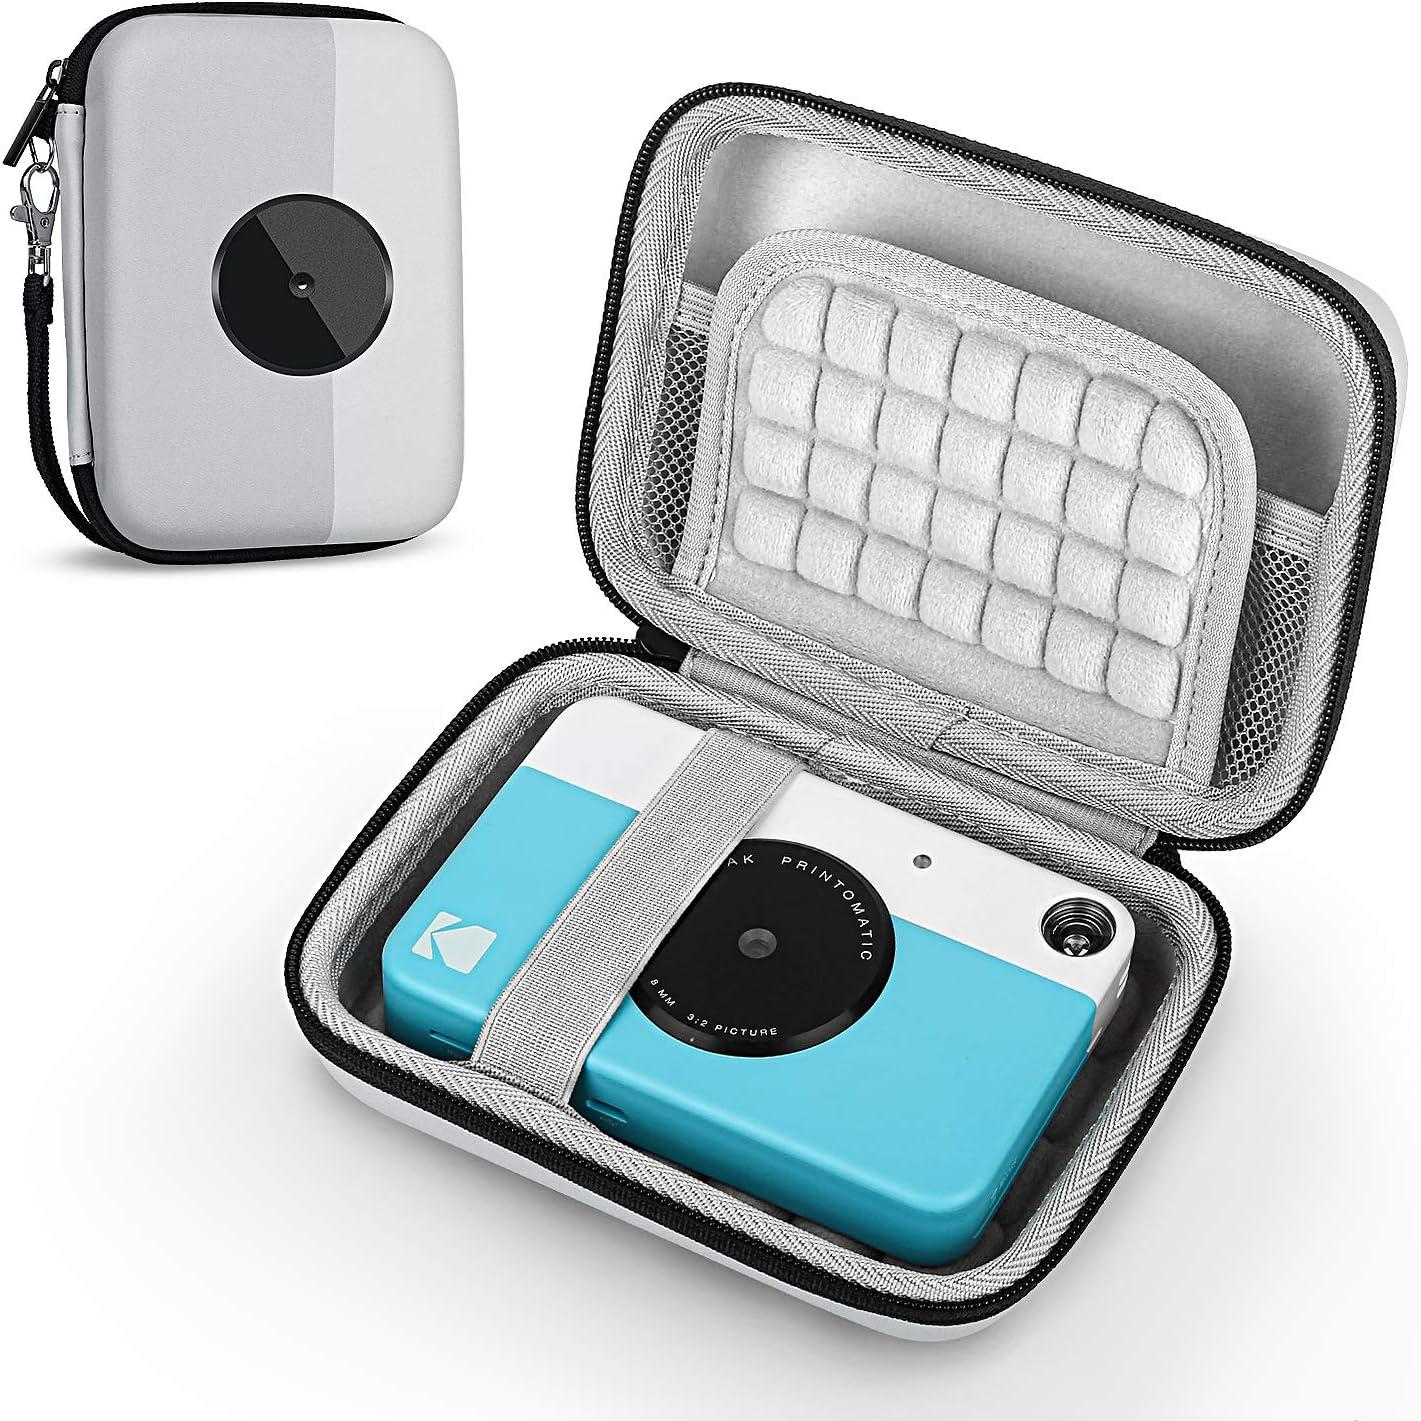 Fromsky Case for Kodak PRINTOMATIC/Smile Digital Instant Print Camera, Travel Carry Case Protective Cover (Grey)